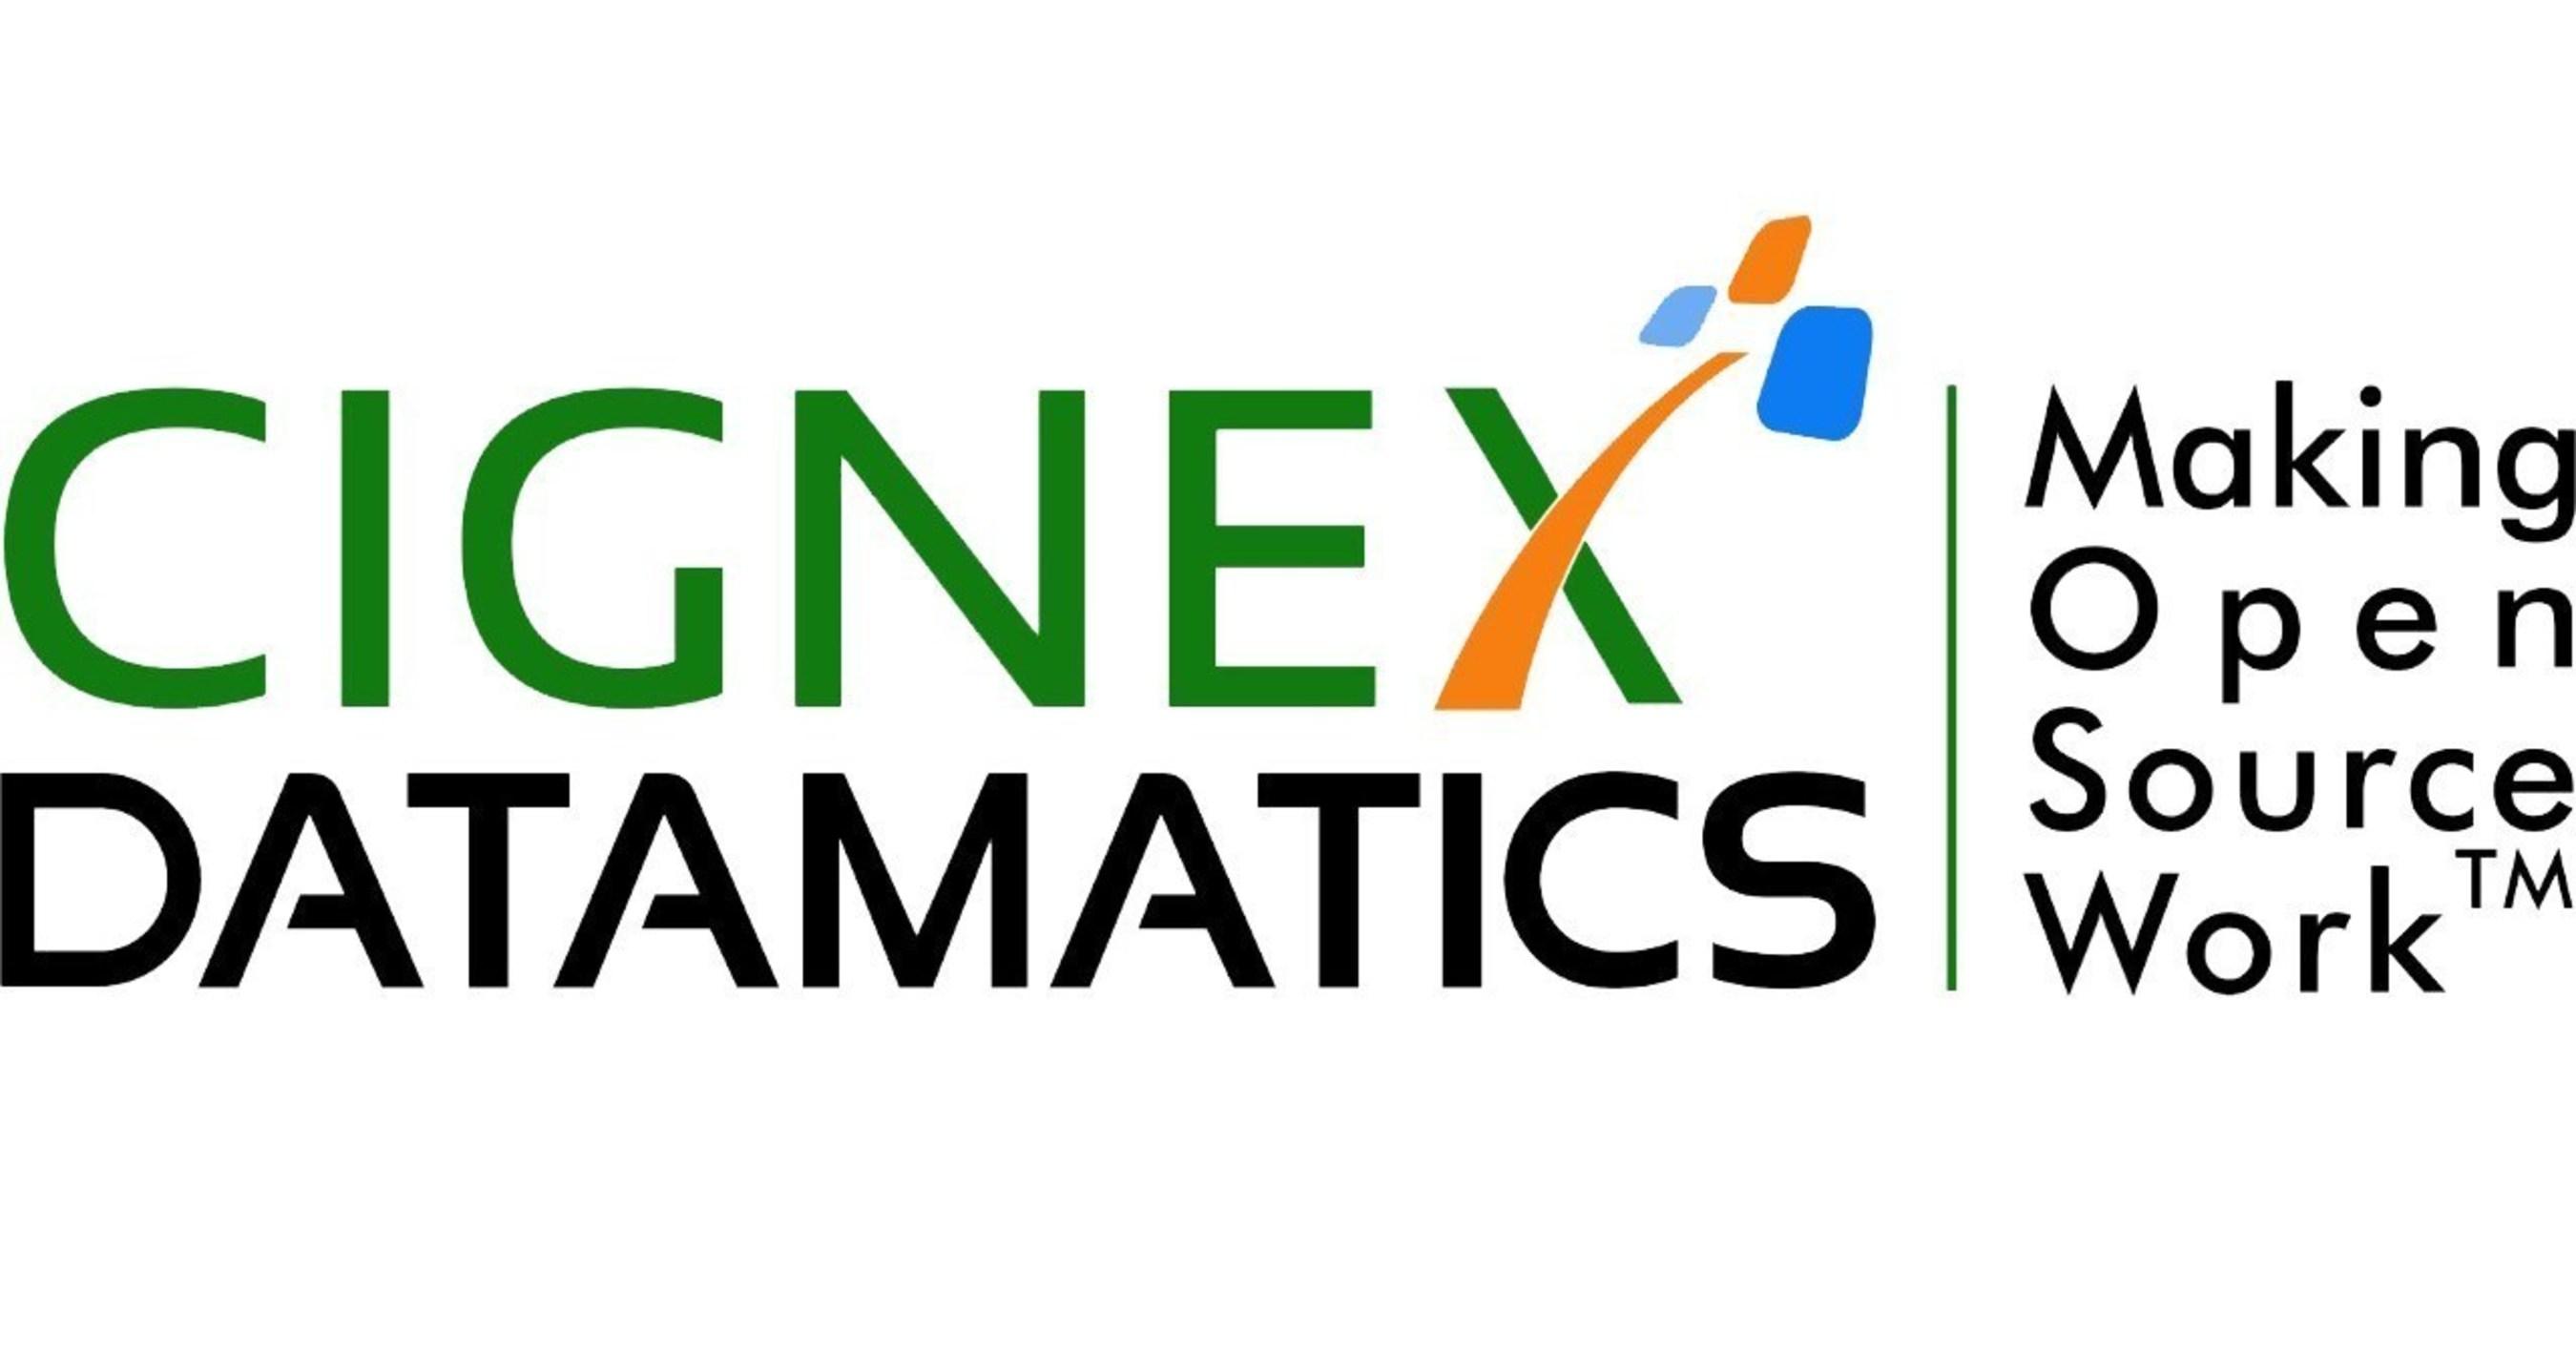 CIGNEX Datamatics Presents Webinar on Delivering Cross-Platform B2C eCommerce Experience With